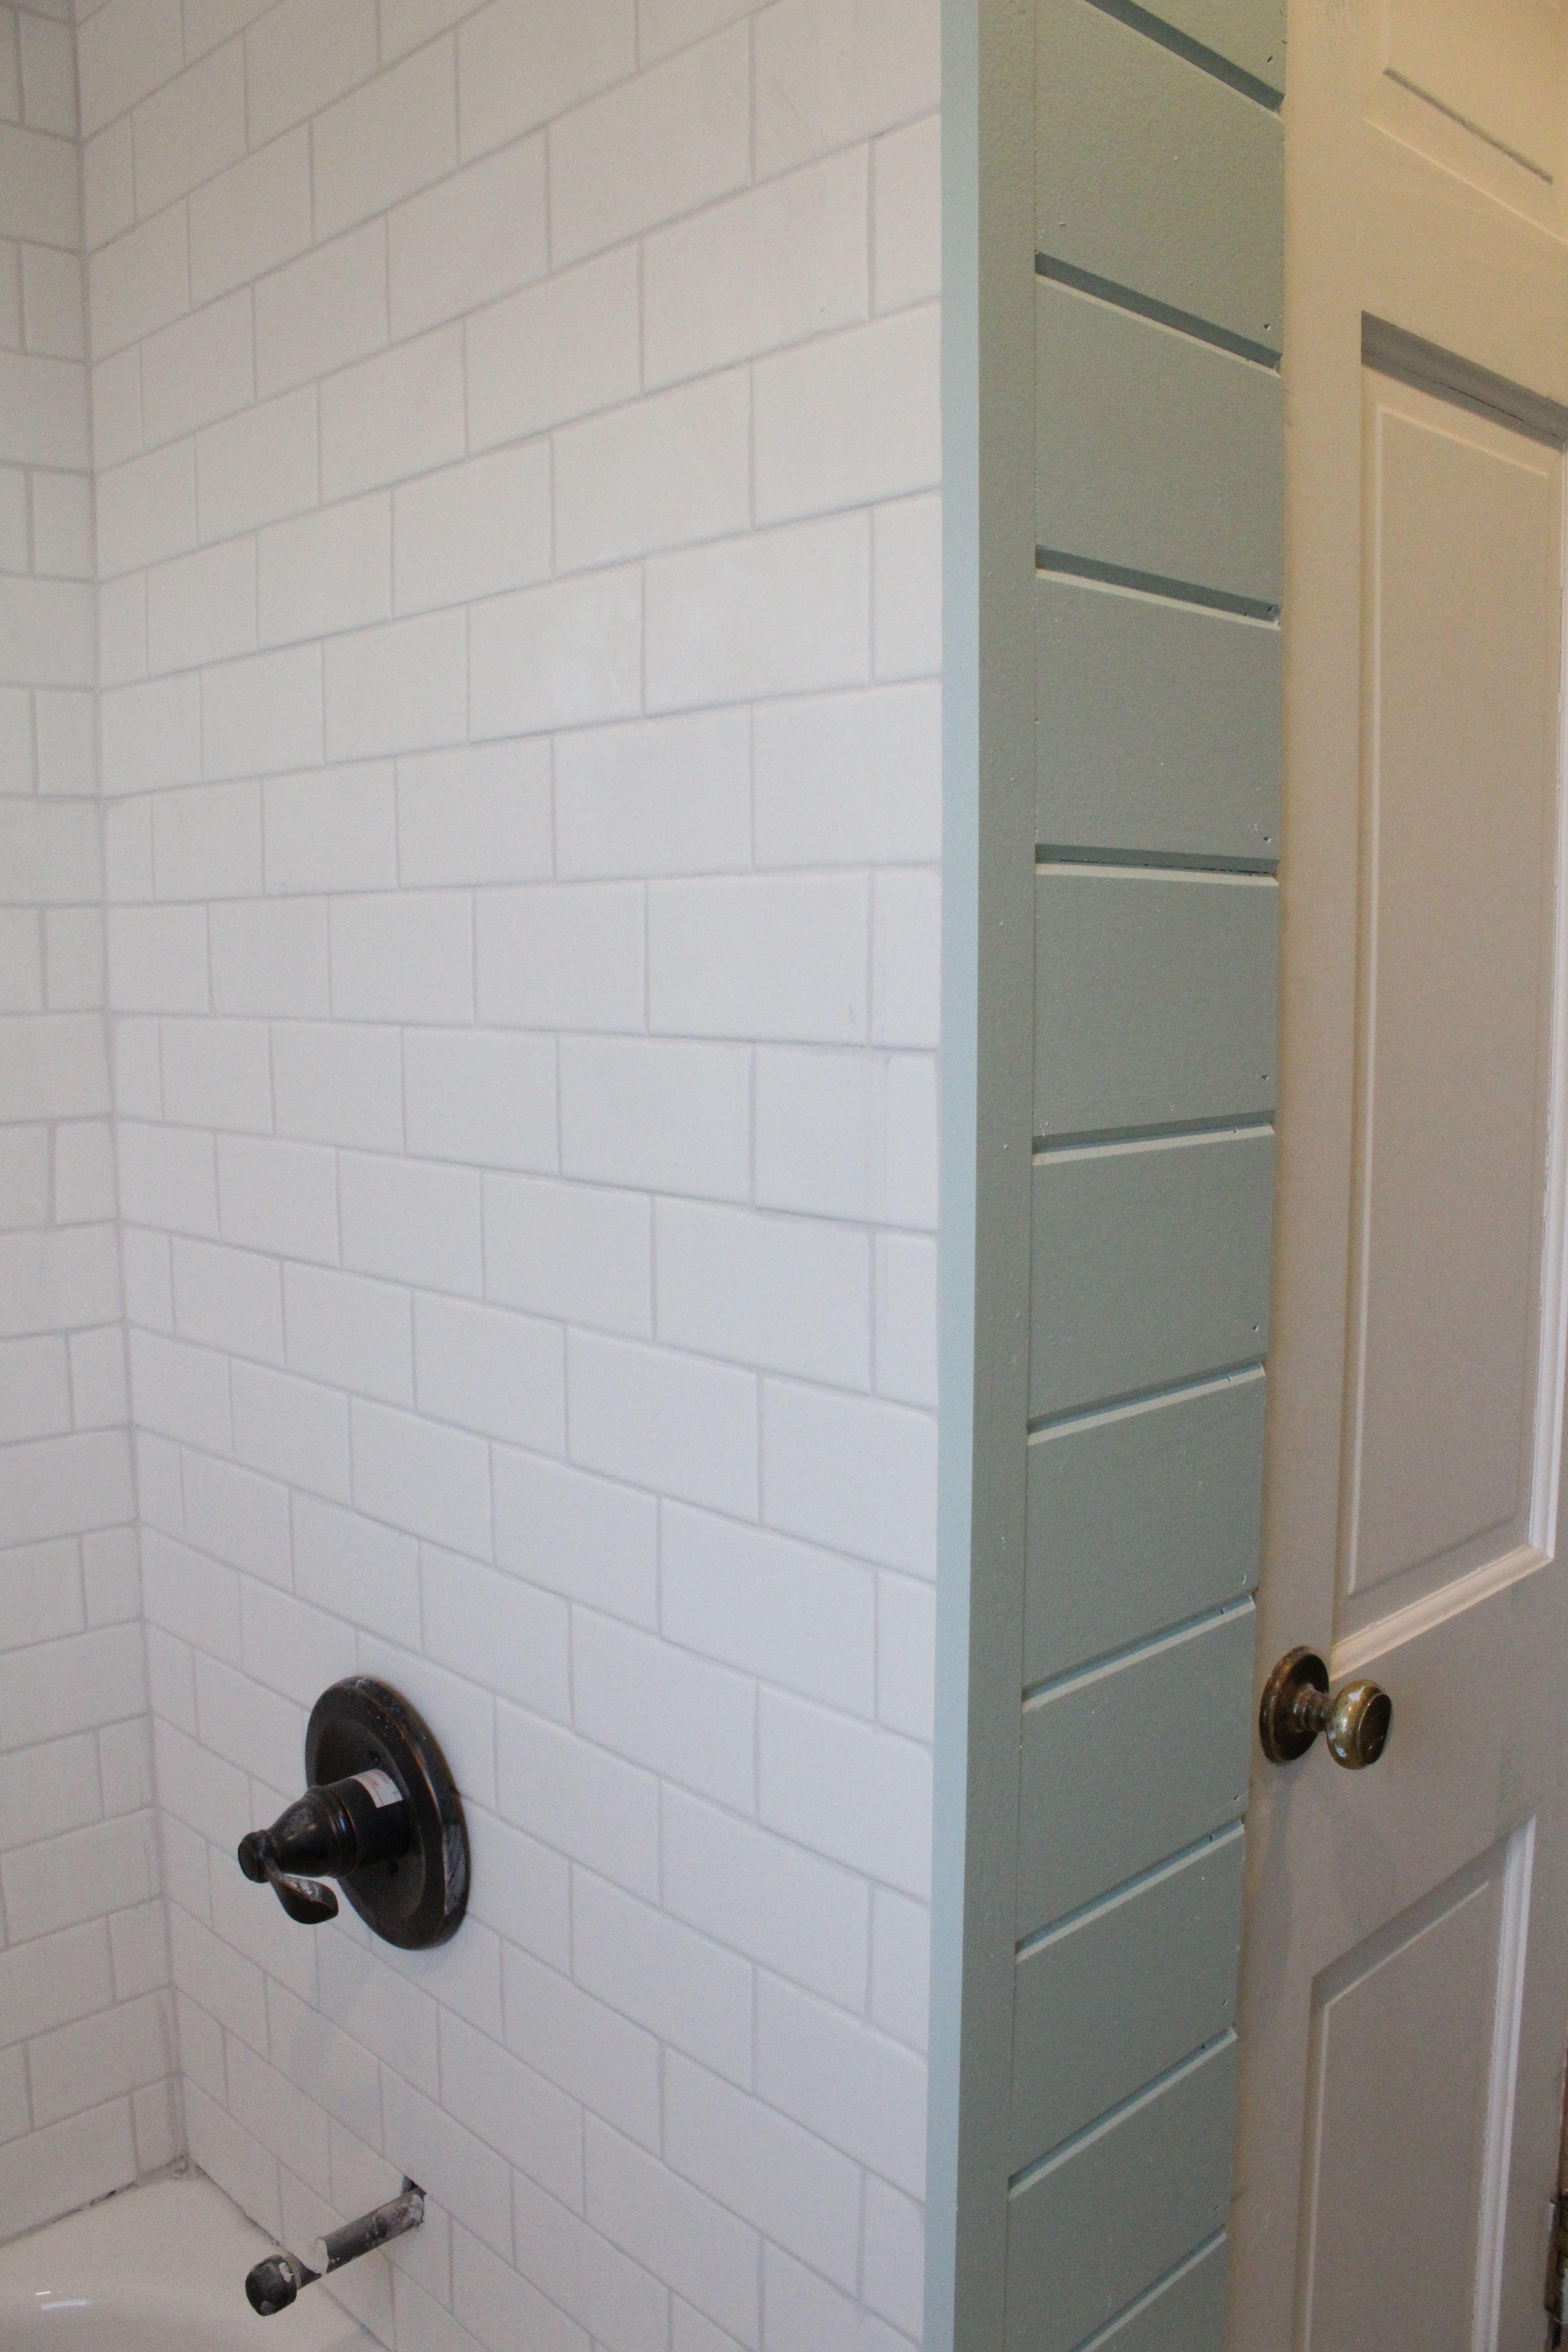 Img 2507 Shower Wall Tile Wood Tile Shower Bathroom Shower Tile